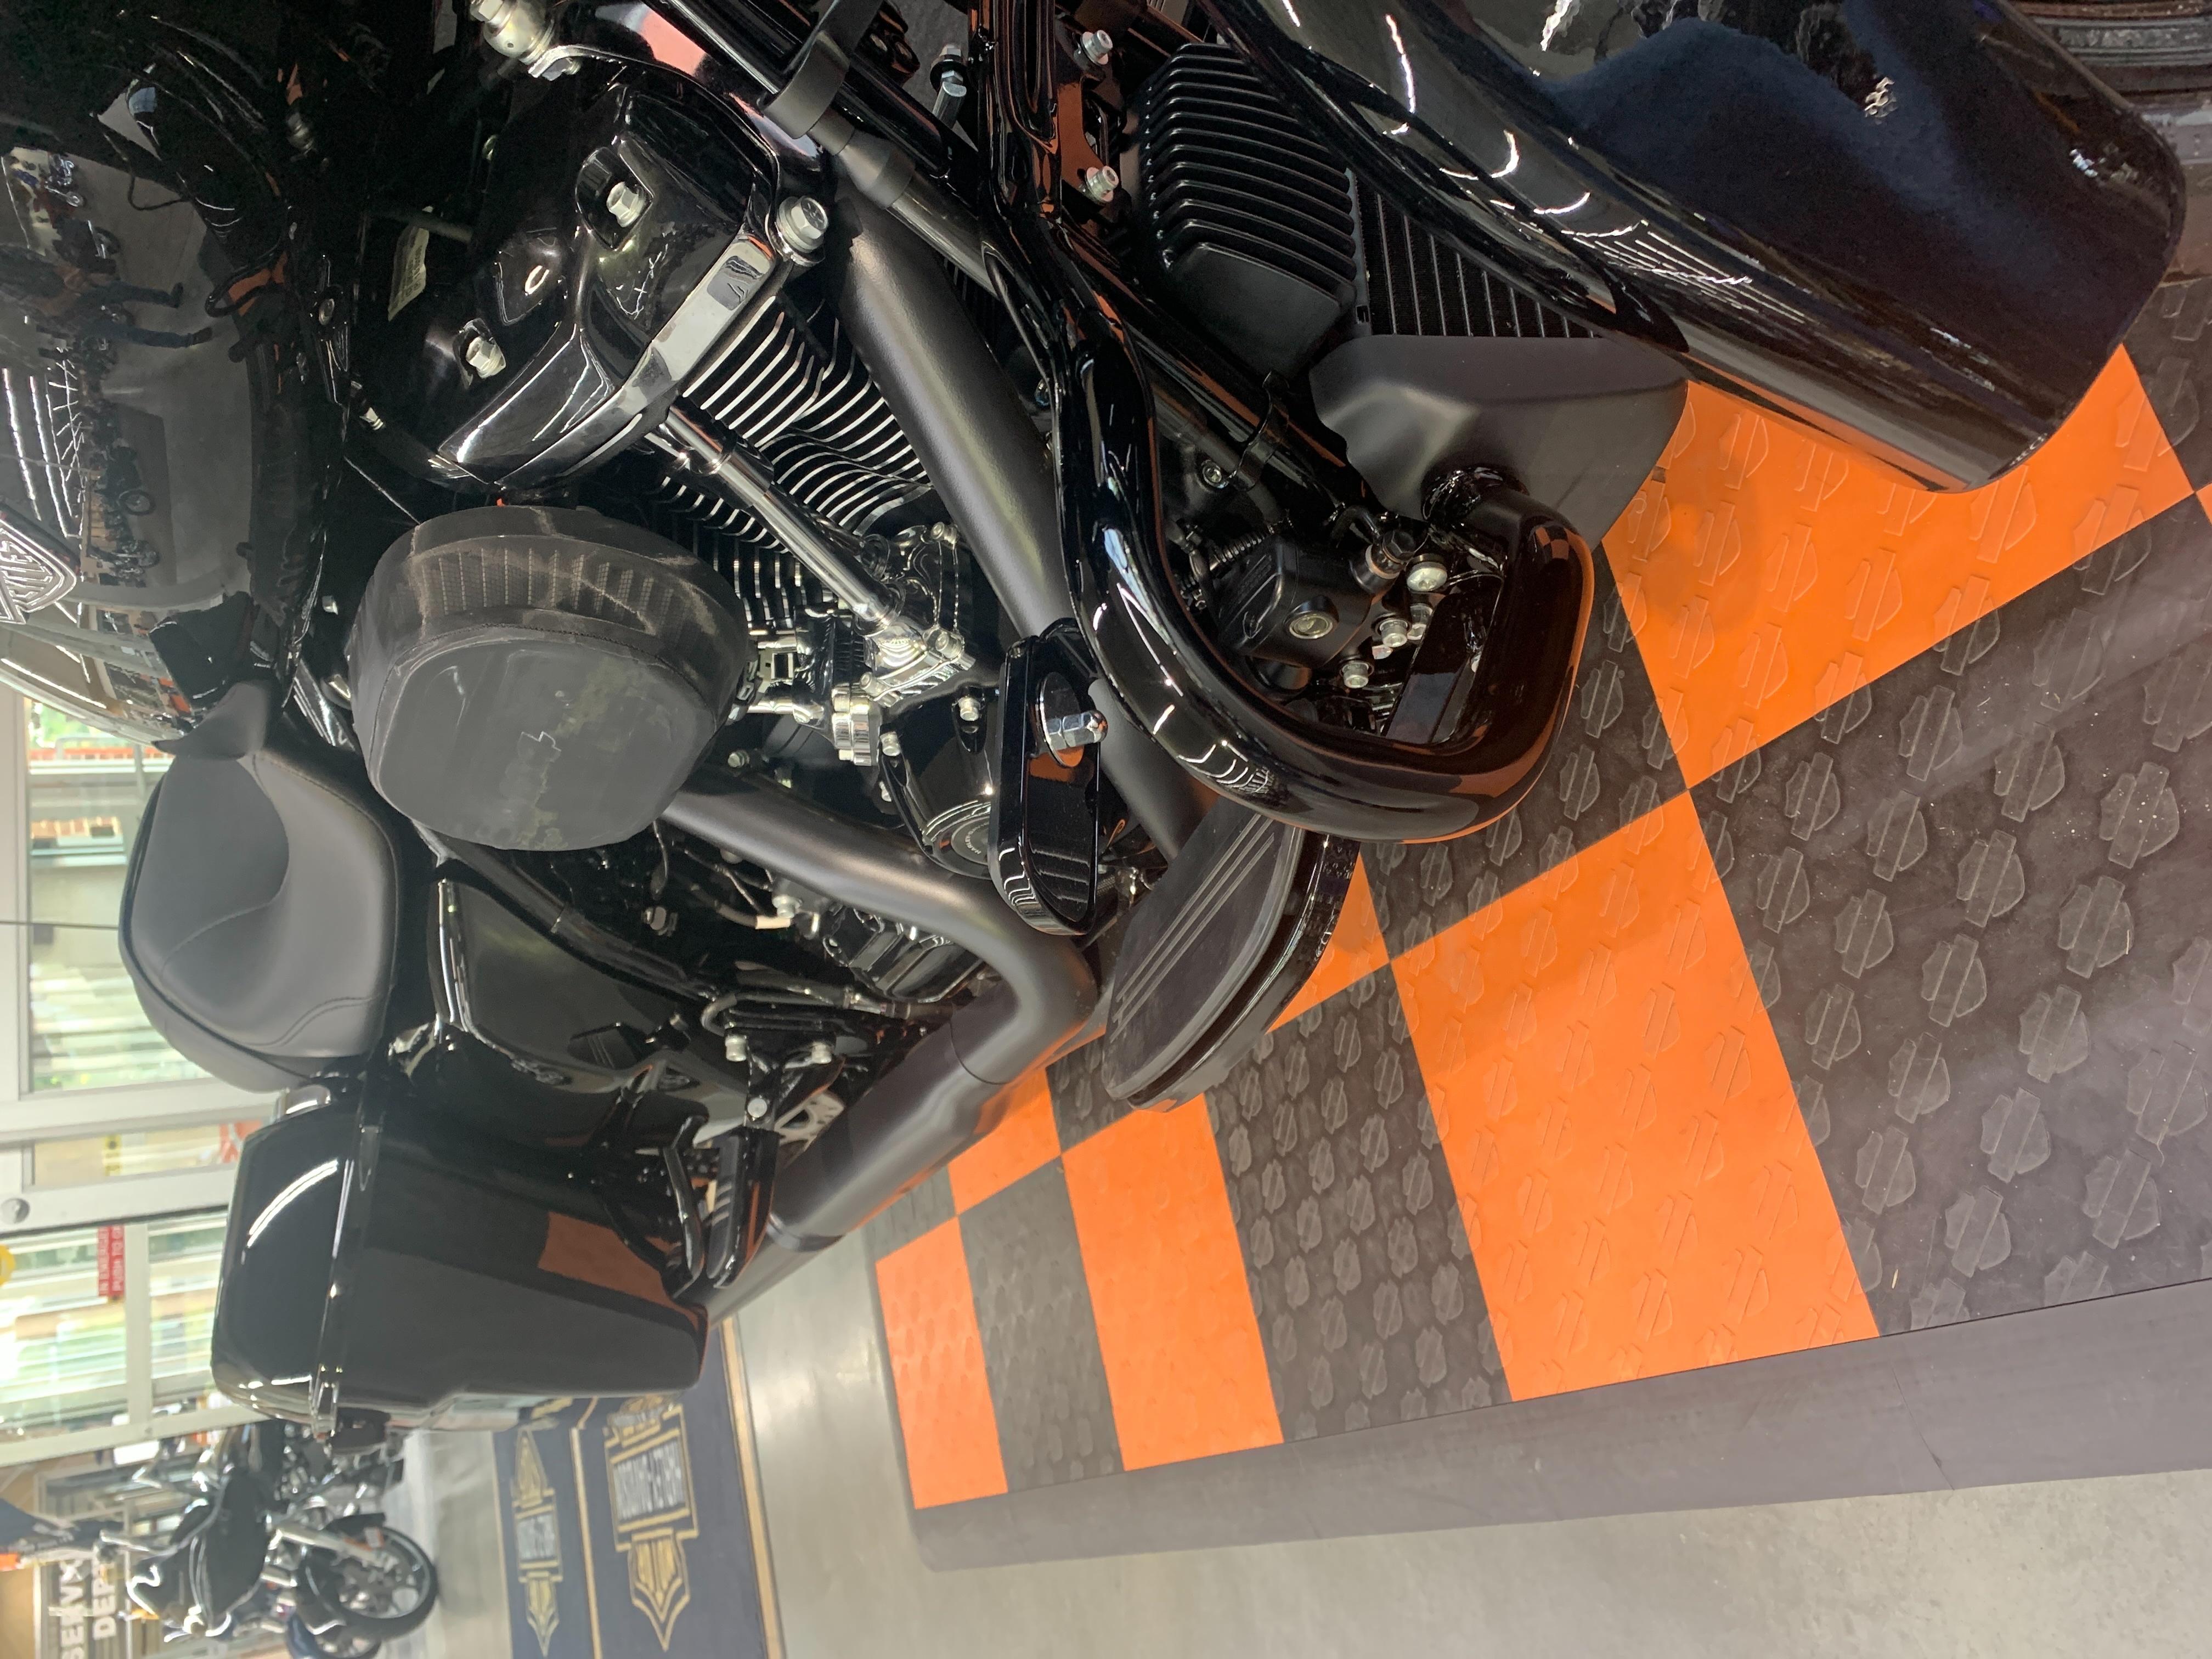 2021 Harley-Davidson Grand American Touring Street Glide Special at Hampton Roads Harley-Davidson